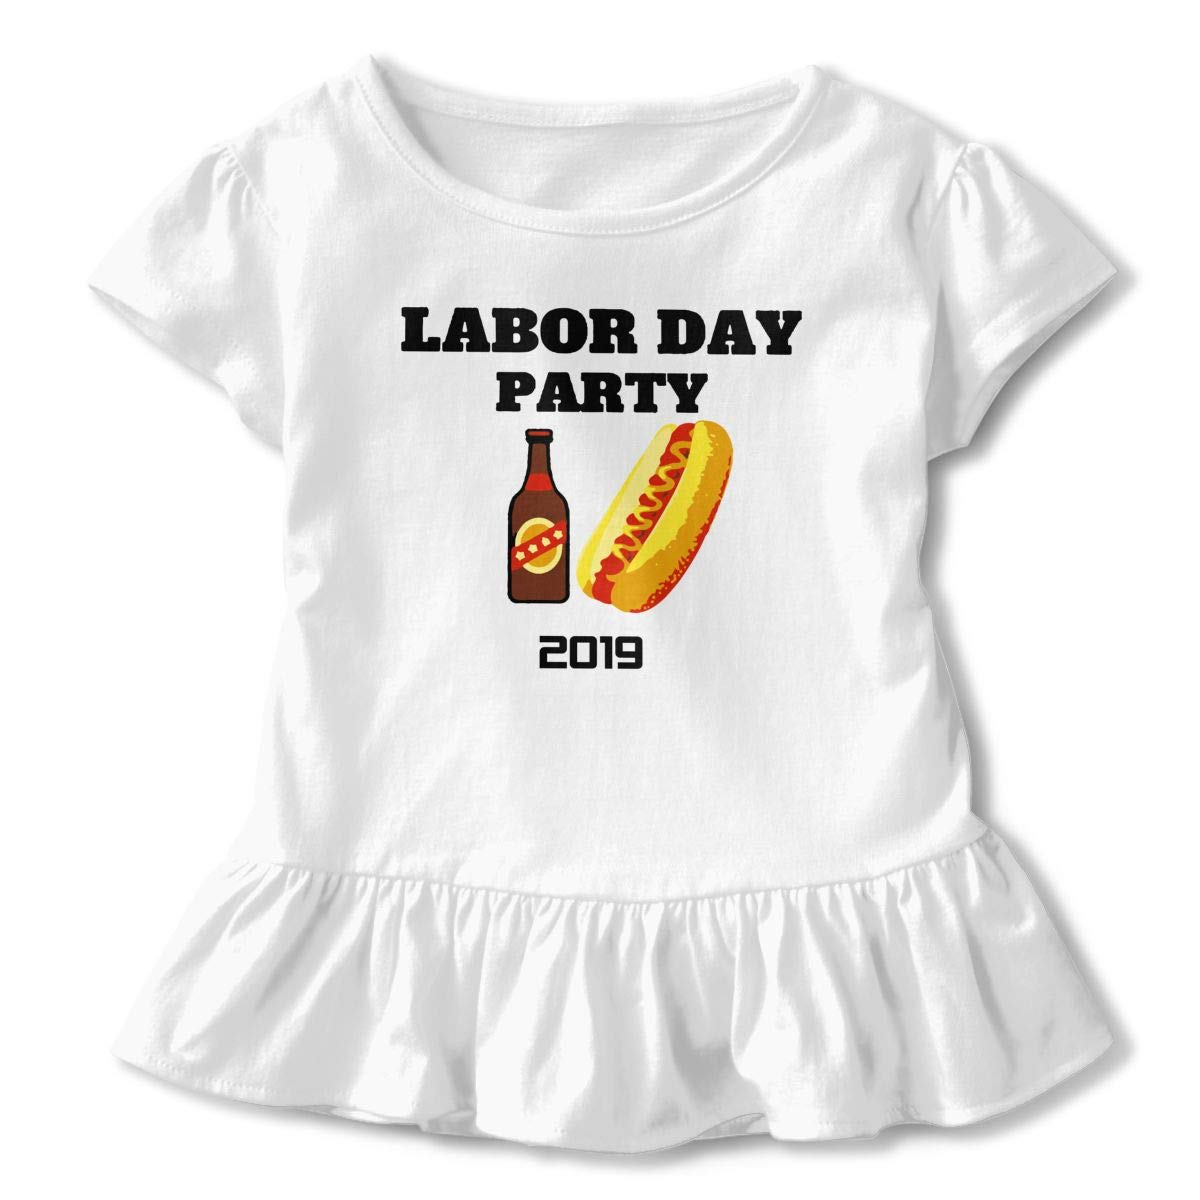 SC/_VD08 Labor Day Party Kids Children Short Sleeve Shirt Top/&Tee